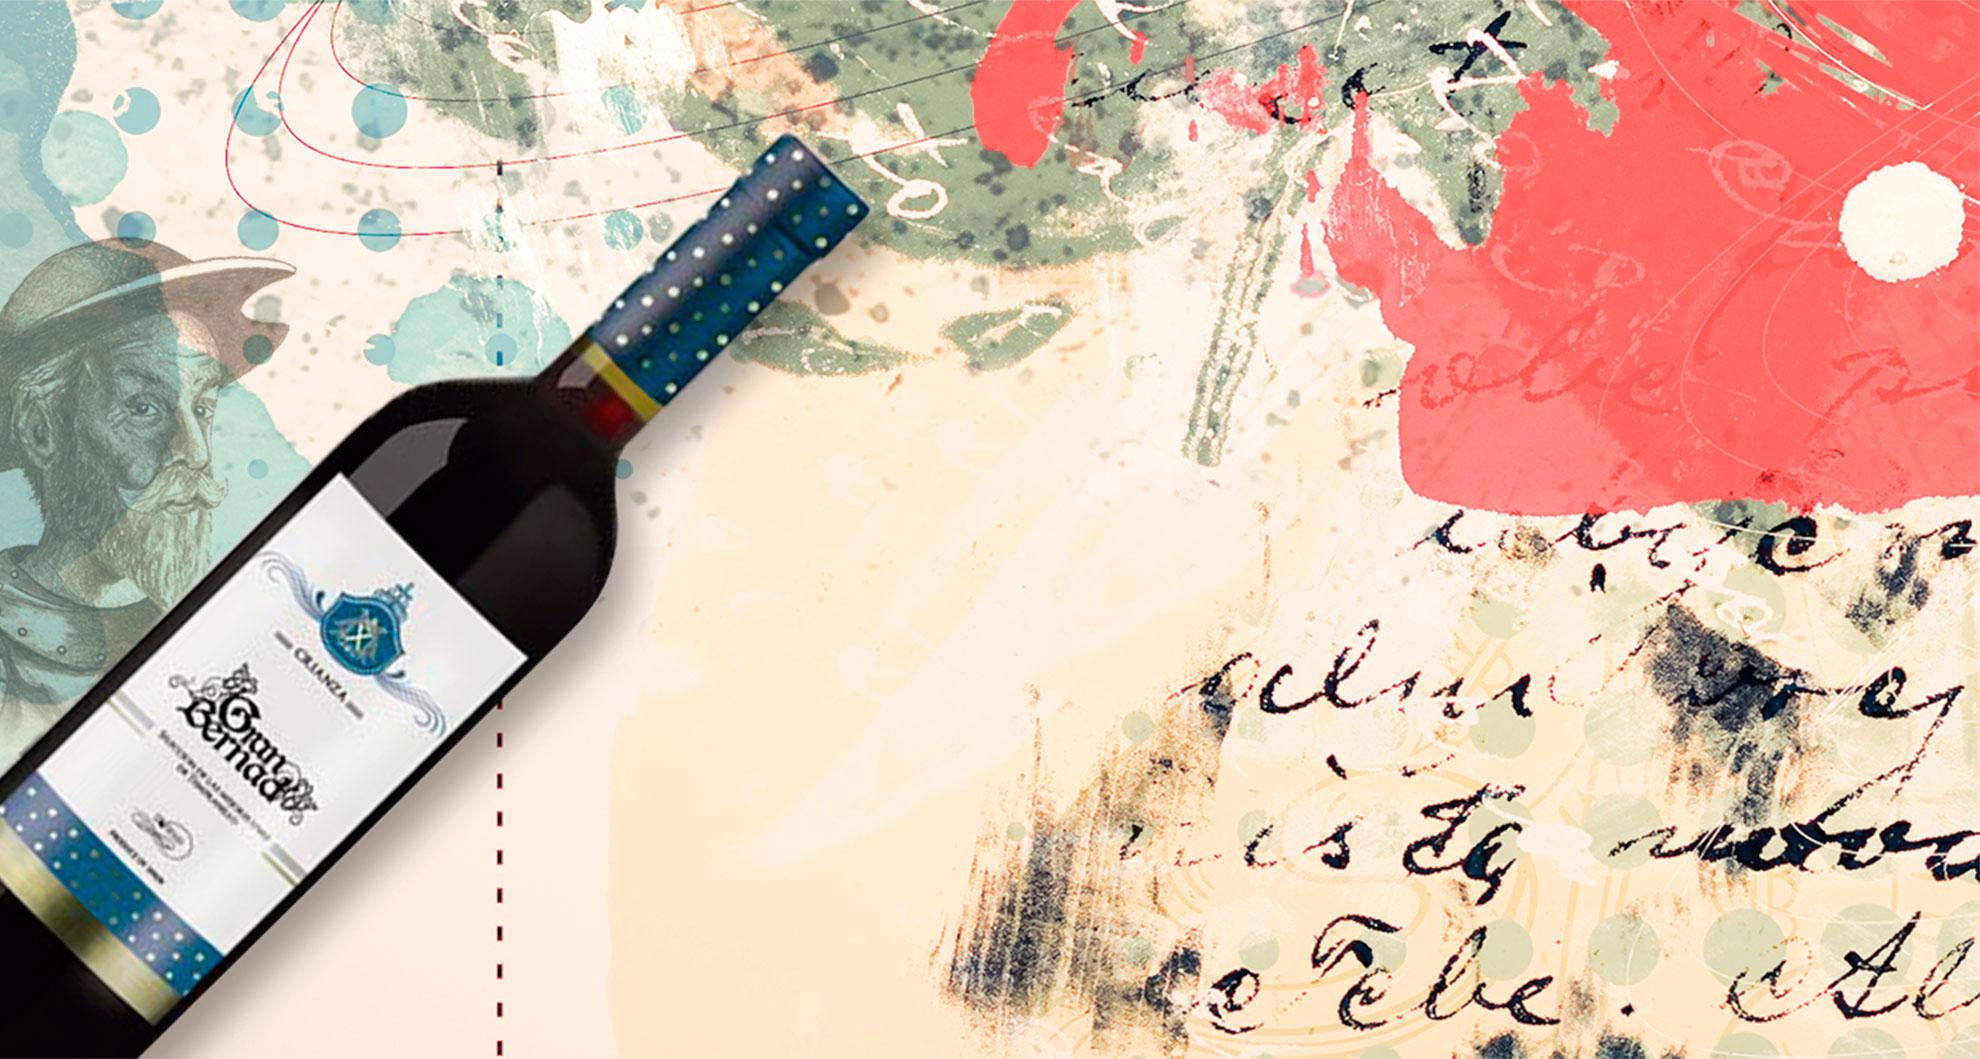 Configura tu botella de vino en Don Quijote Wines